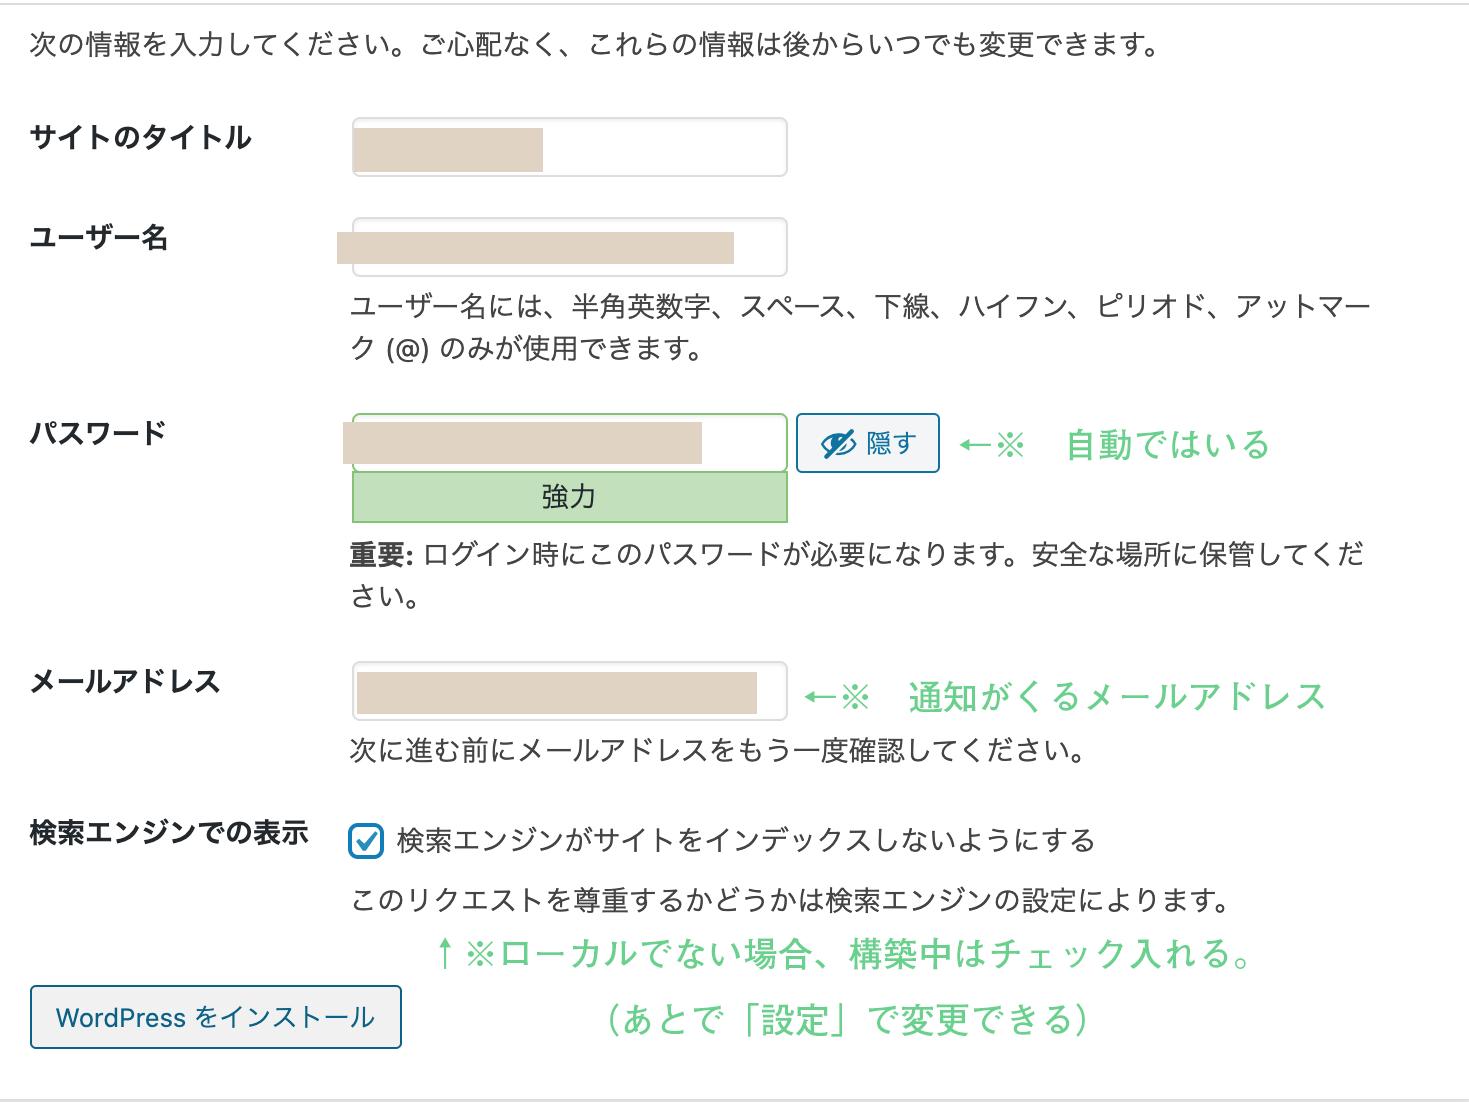 WordPressフォルダのインストール